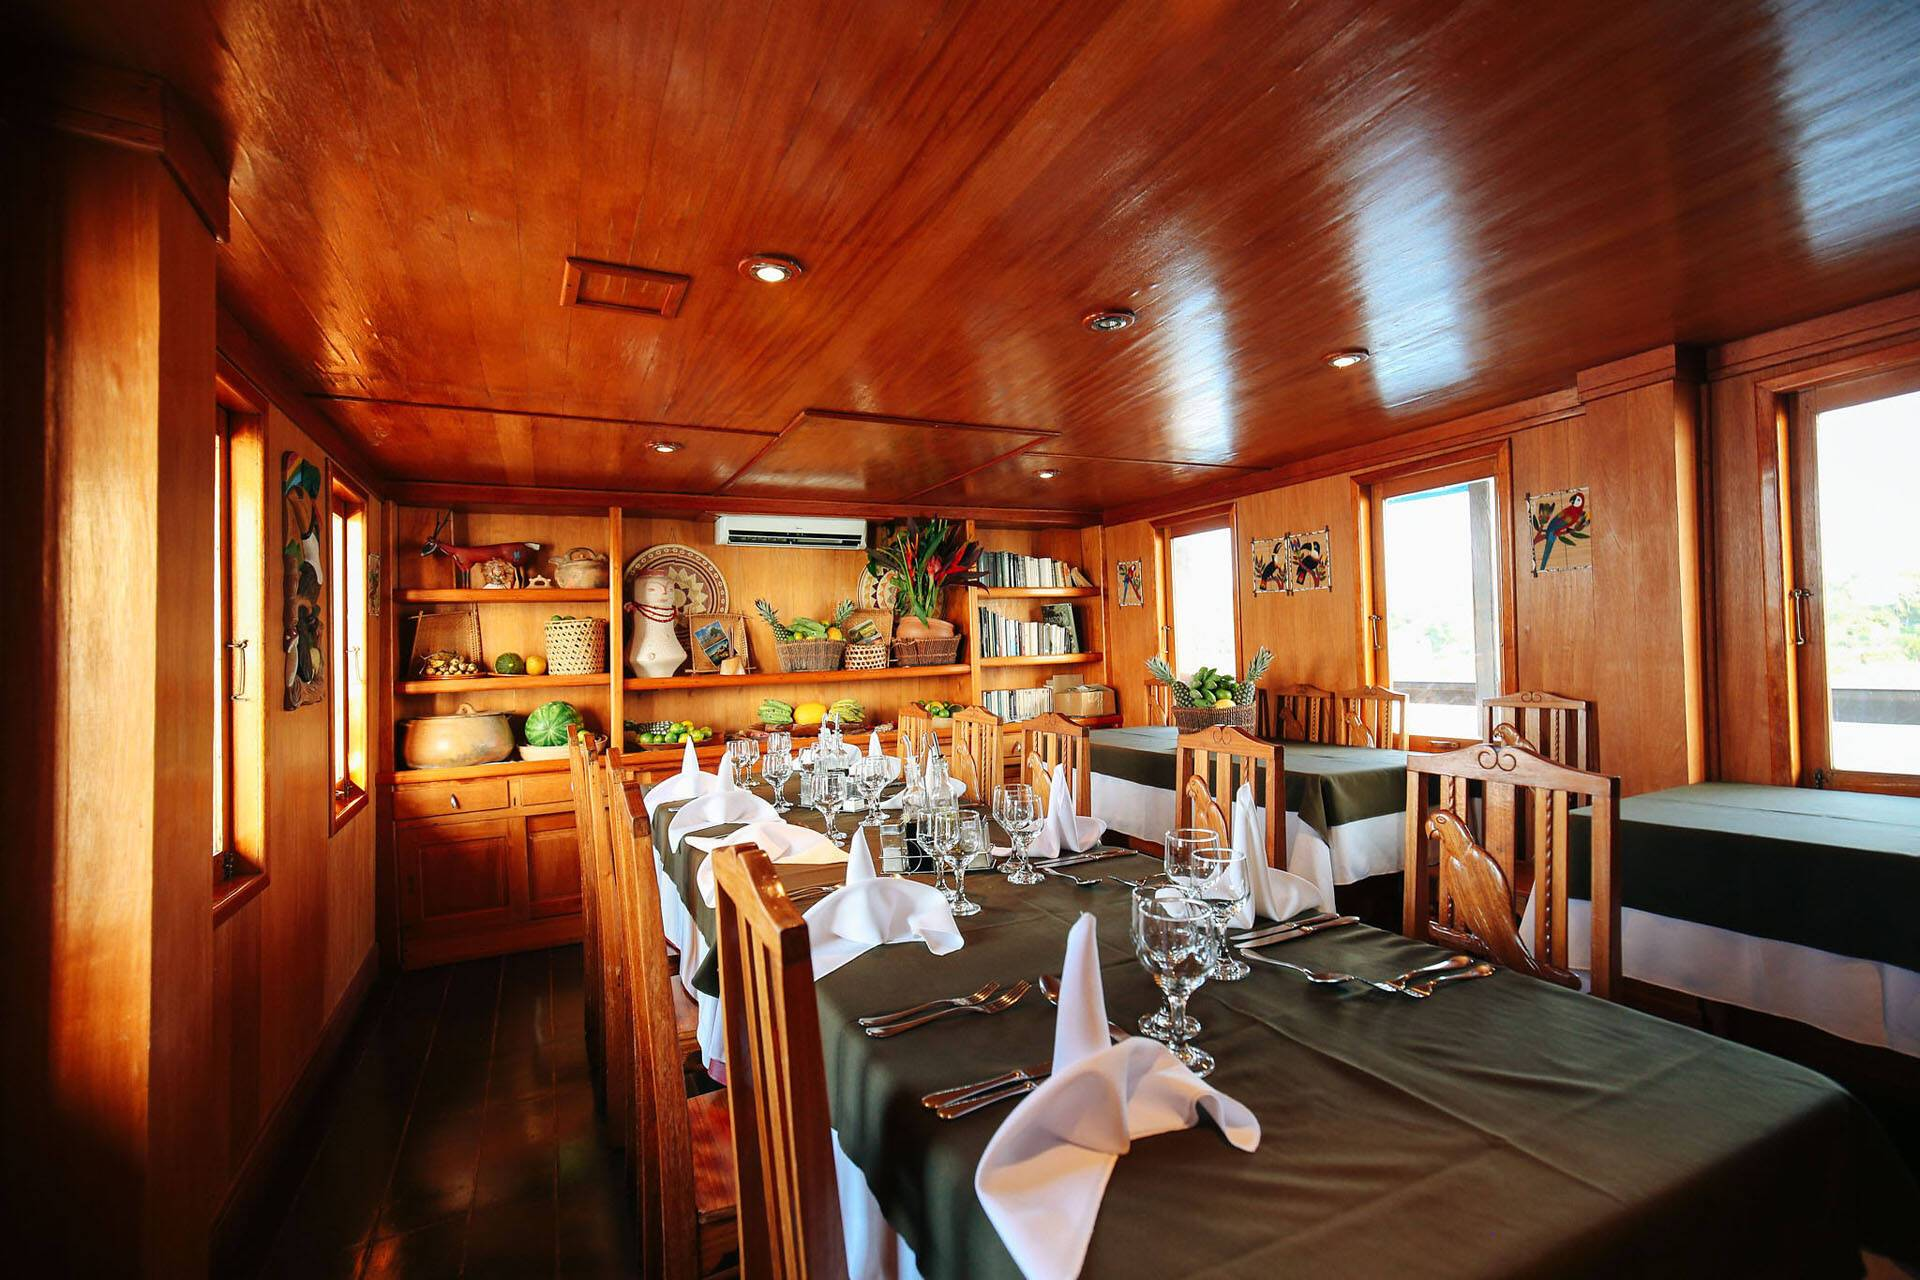 Amanzon Dream Bateau Bresil Restaurant